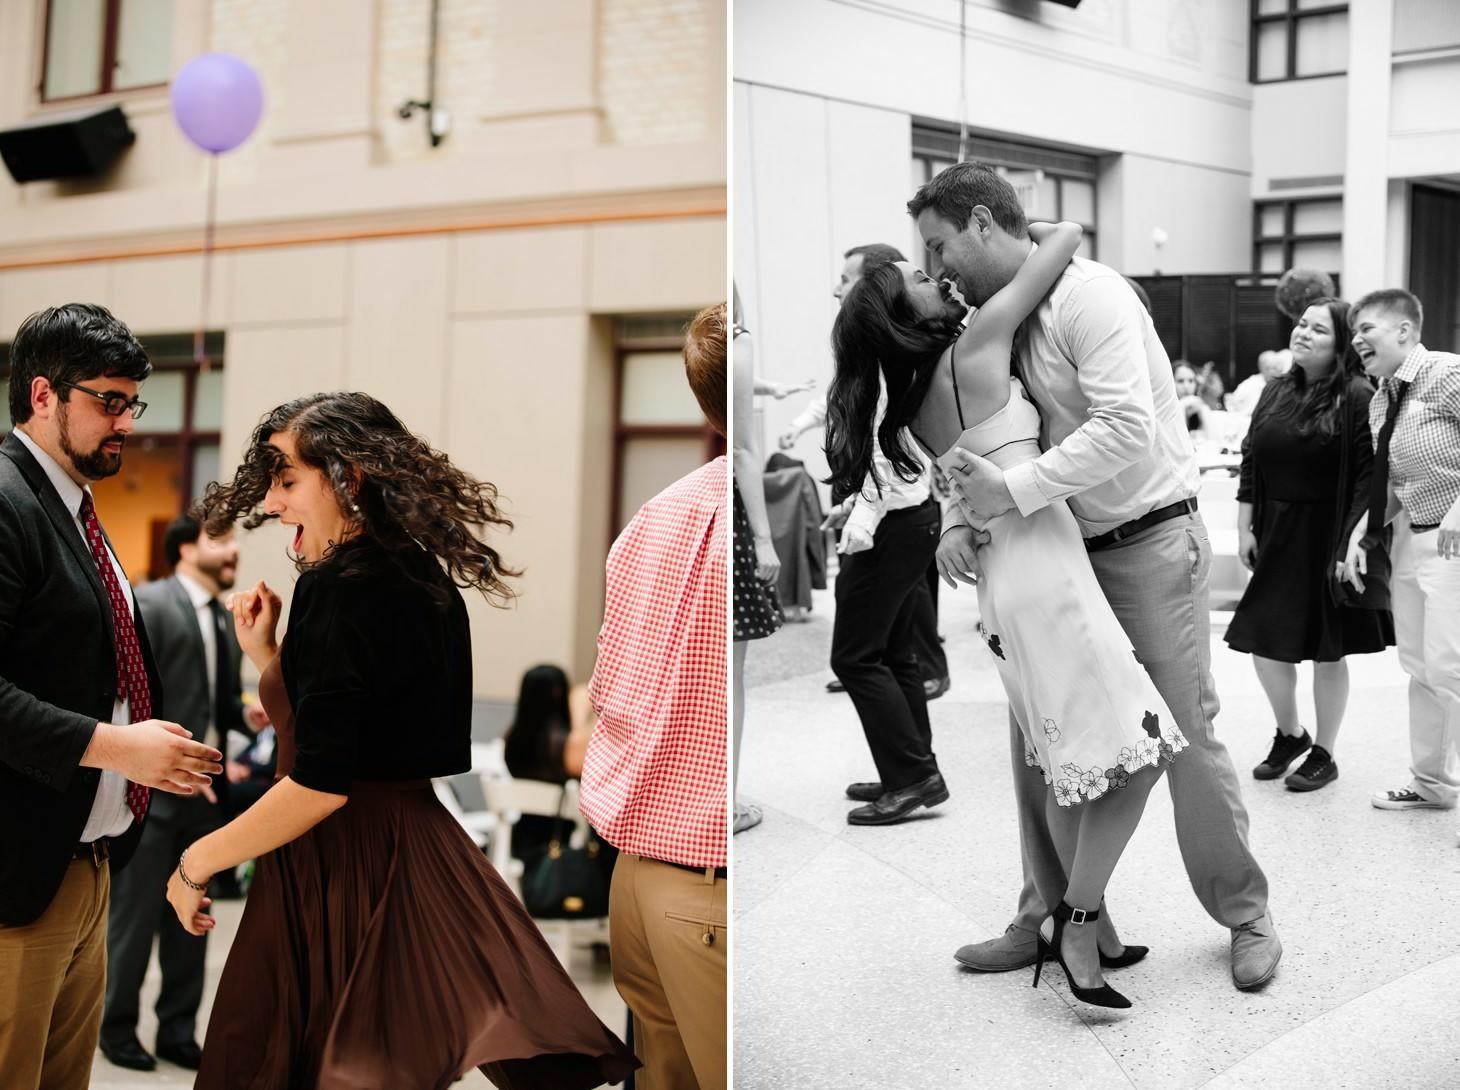 090-nyc-wedding-photographer-hoboken-waterfront-wedding-photos-smitten-chickens.jpg